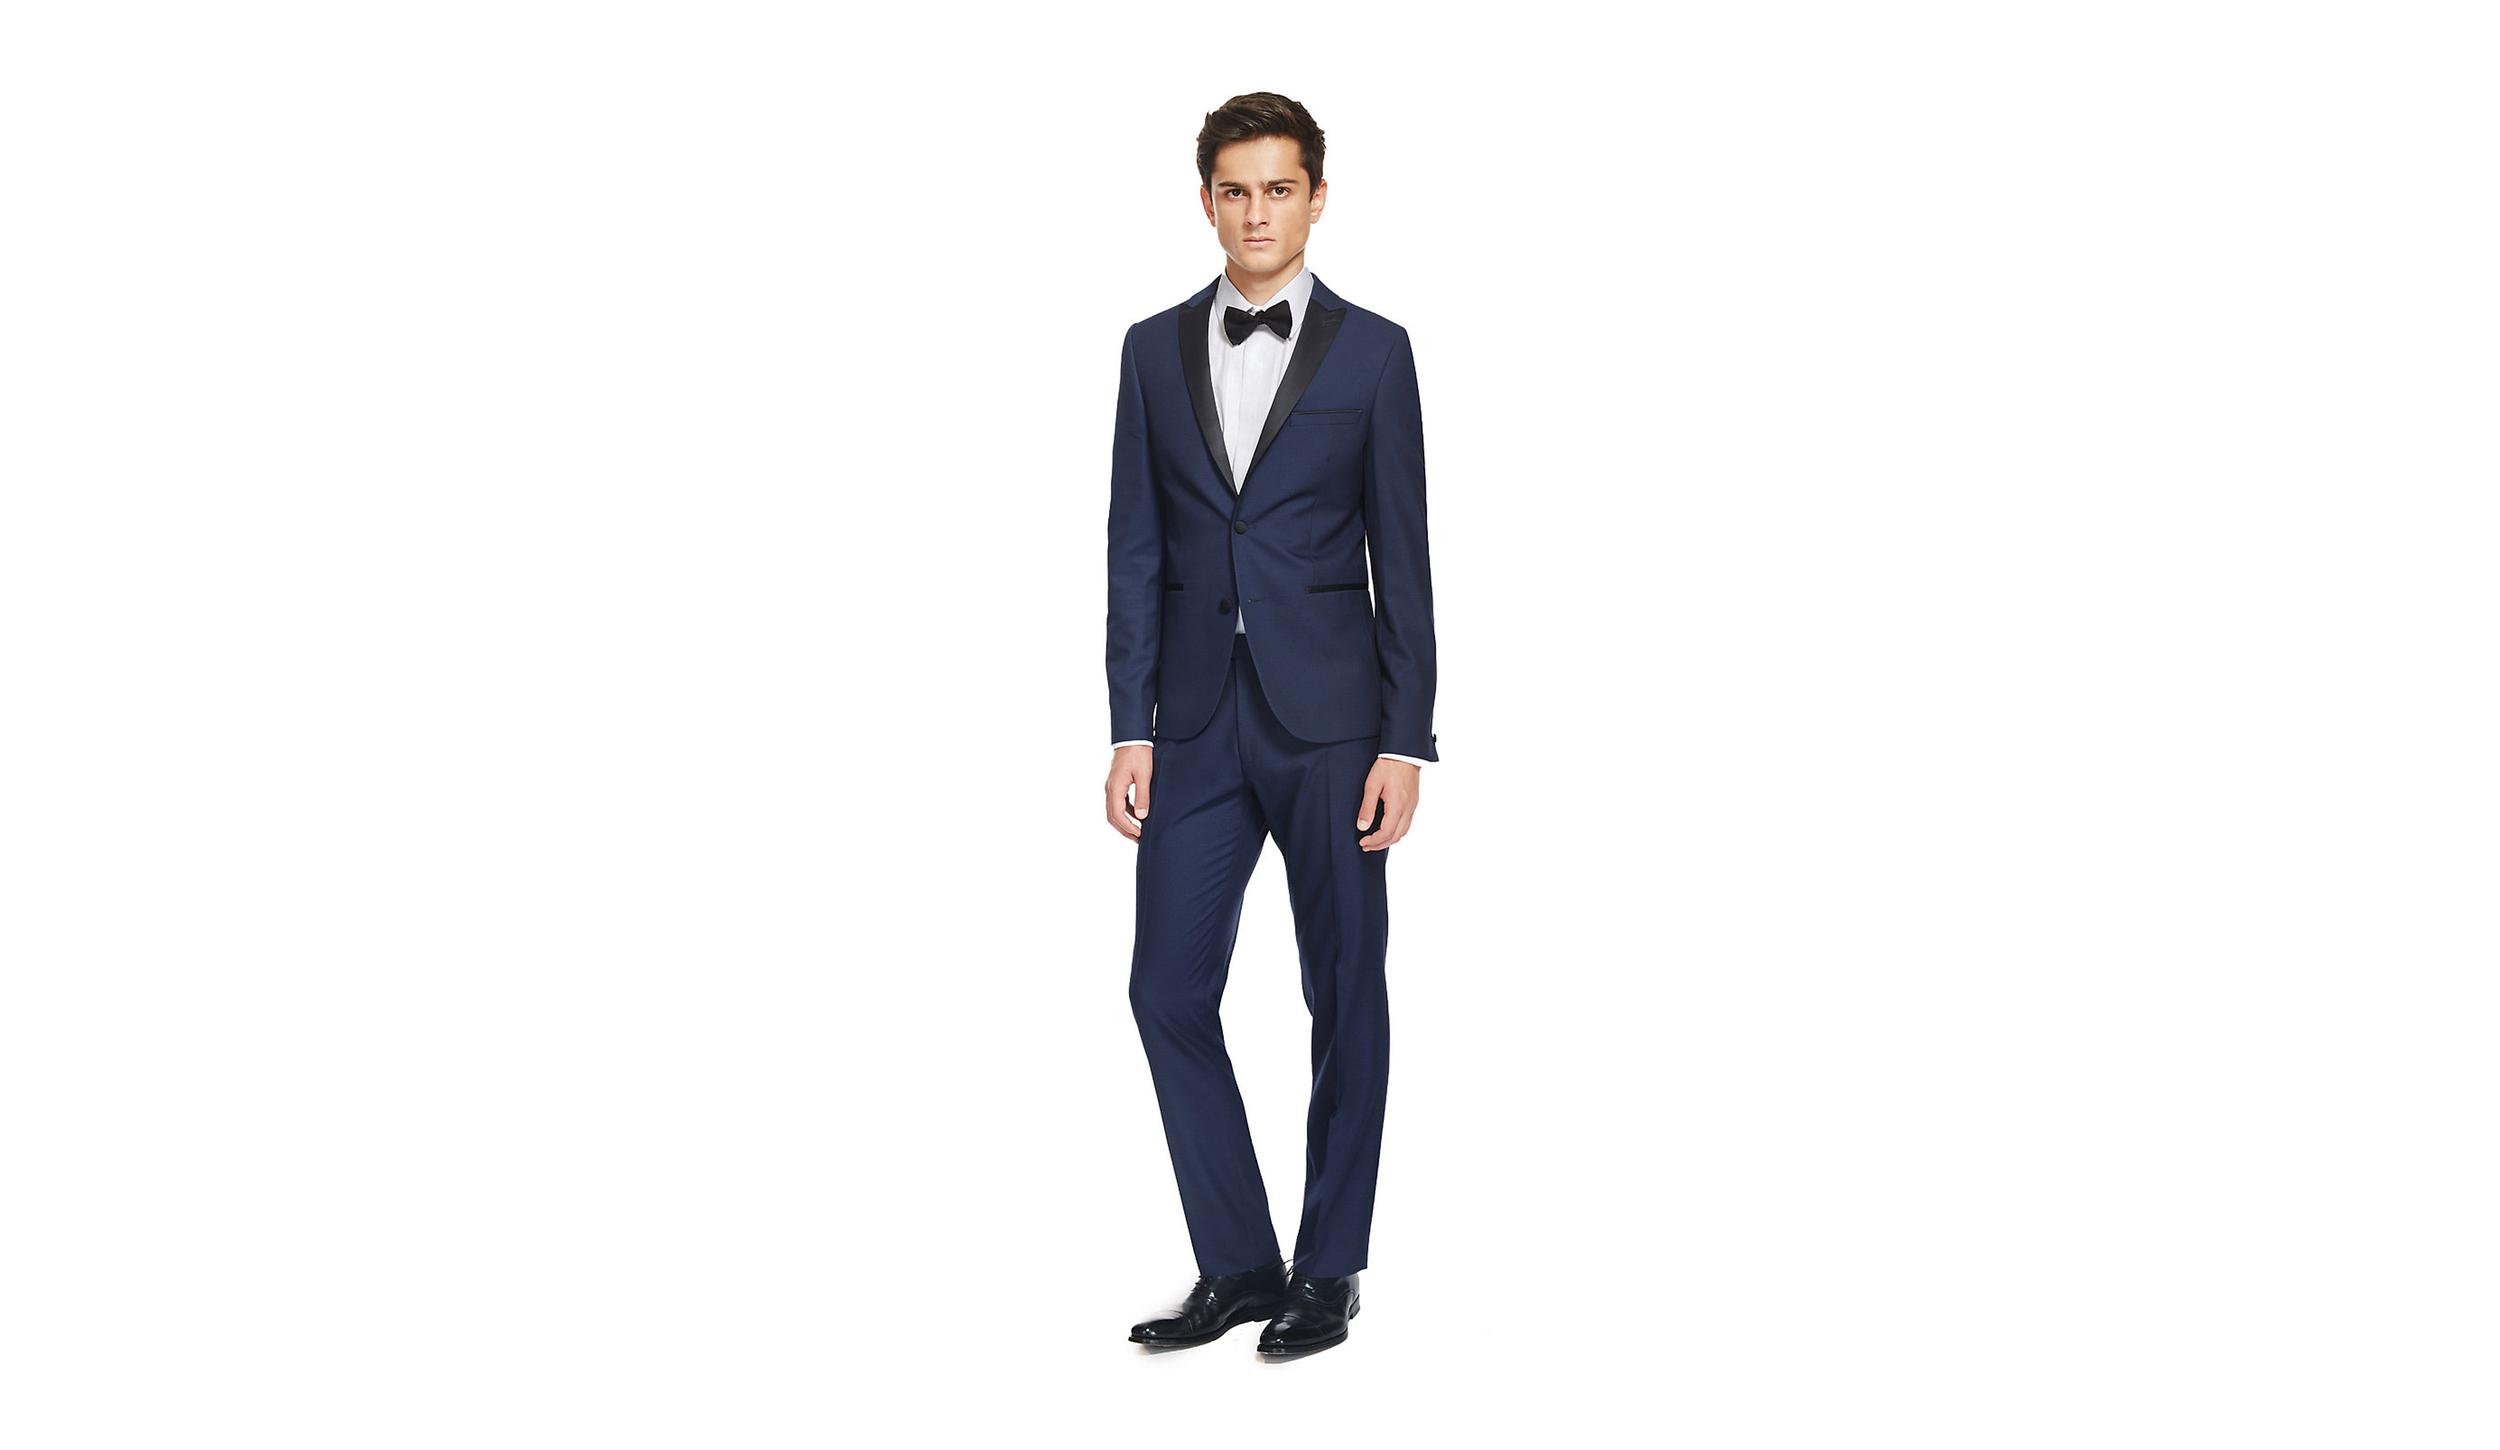 BRIT Awards | Marks & Spencer mens style | Sam squire uk male fashion blogger